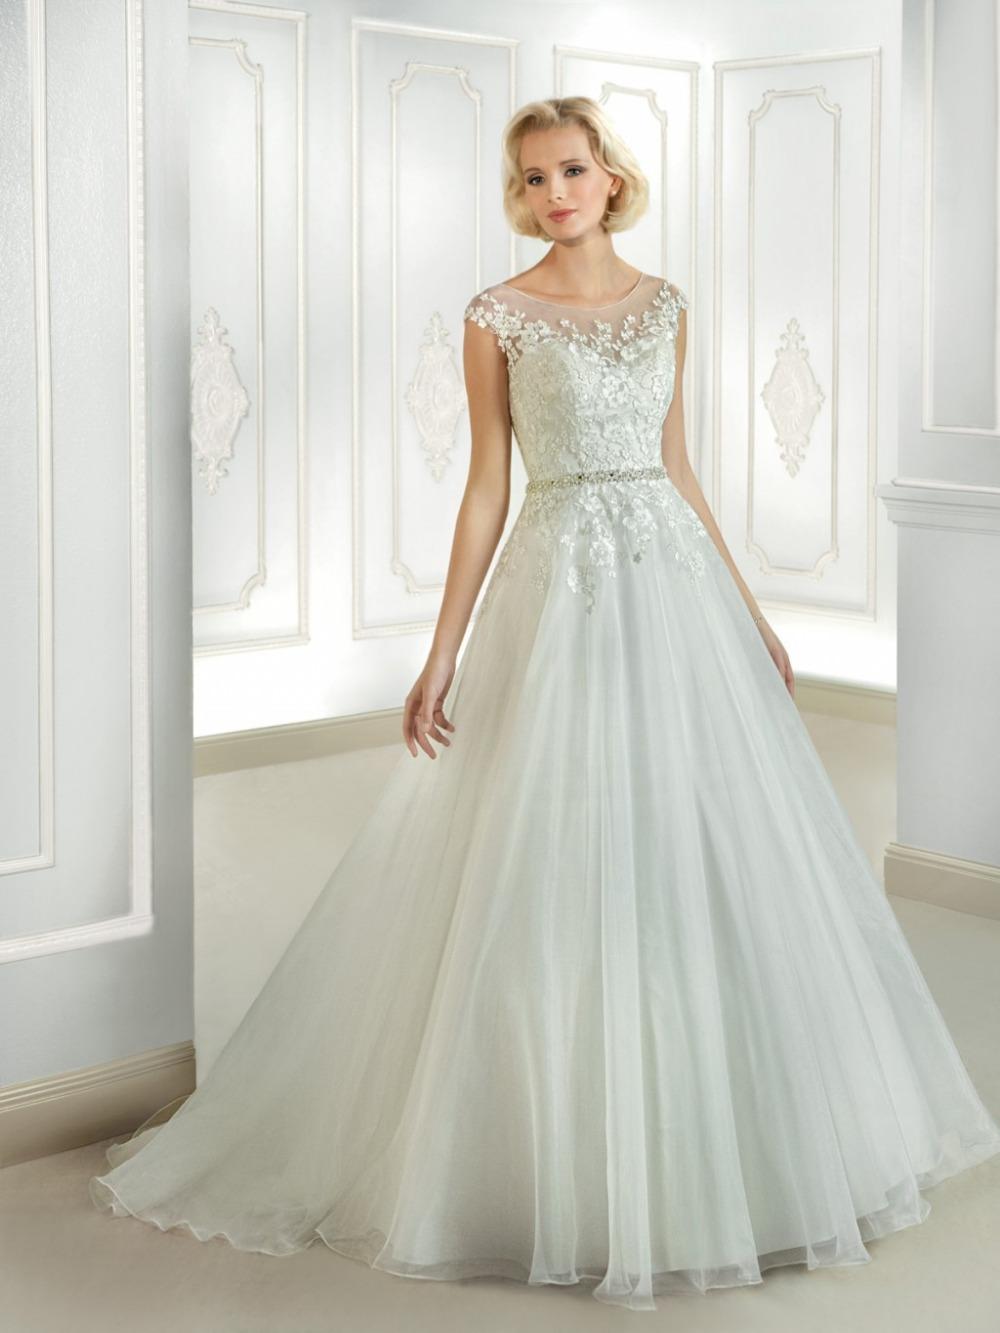 Vestido de noiva ball gown wedding dress see through back for See through wedding dresses